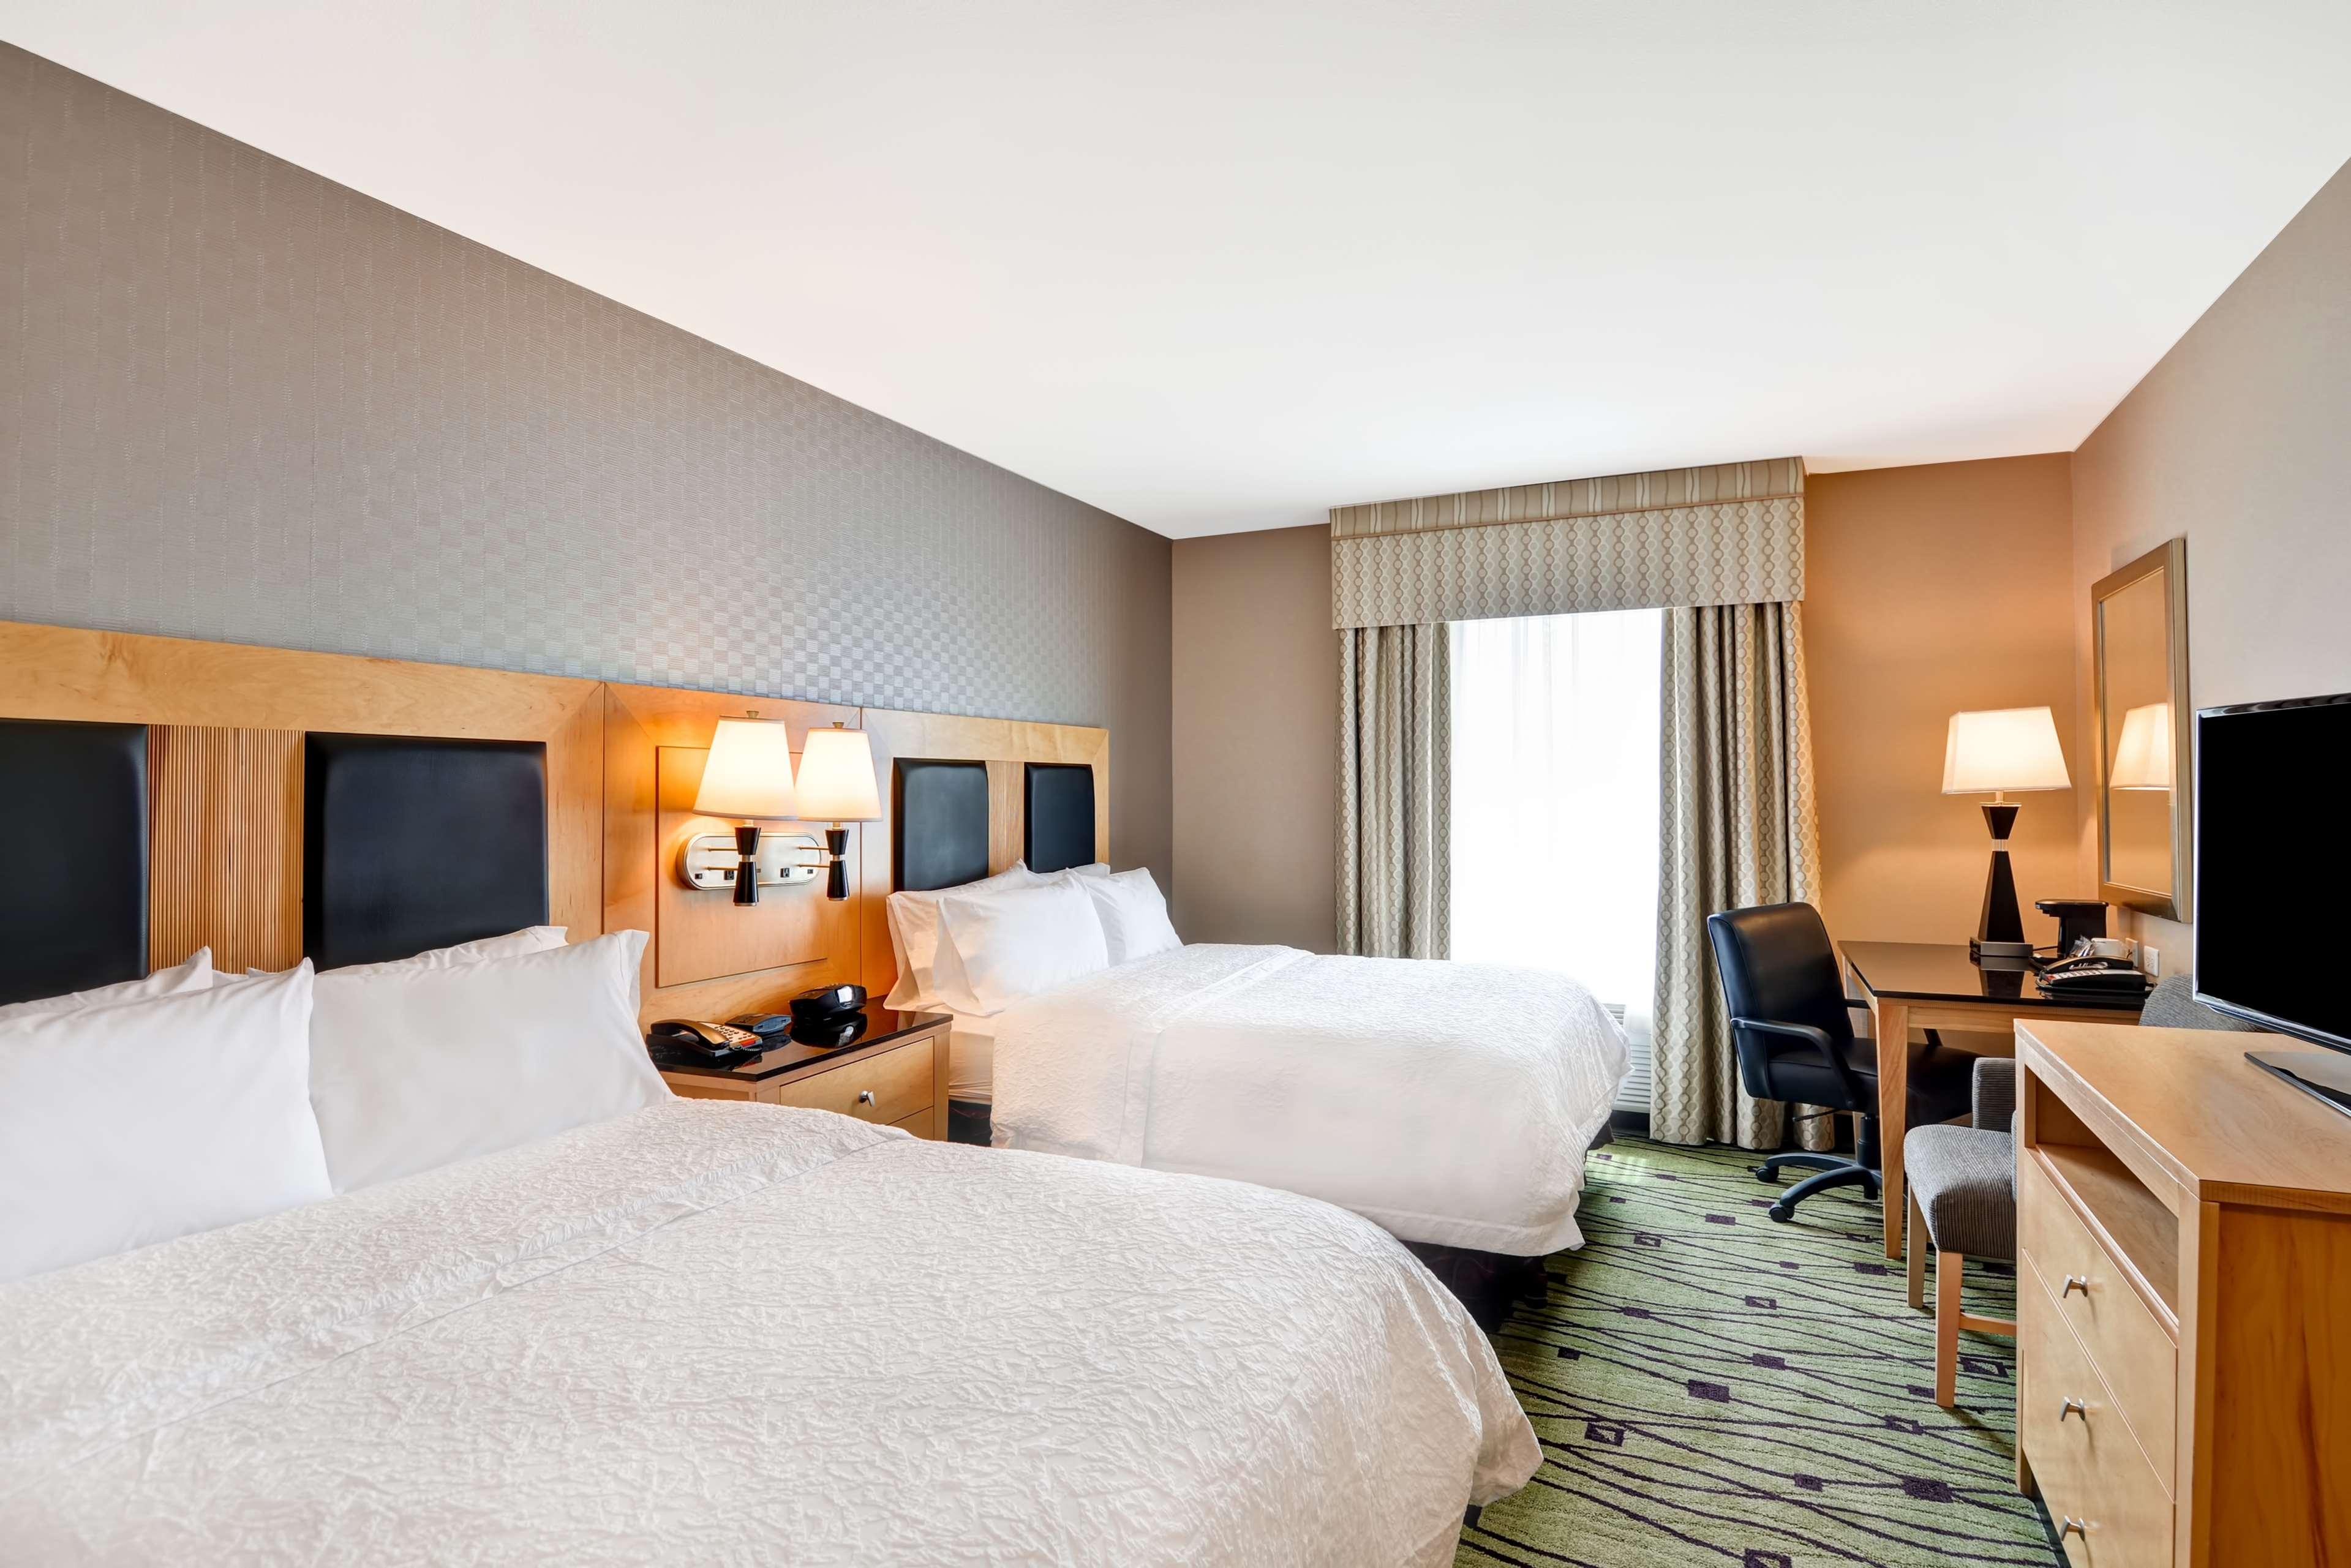 Hampton Inn & Suites Raleigh/Crabtree Valley image 37